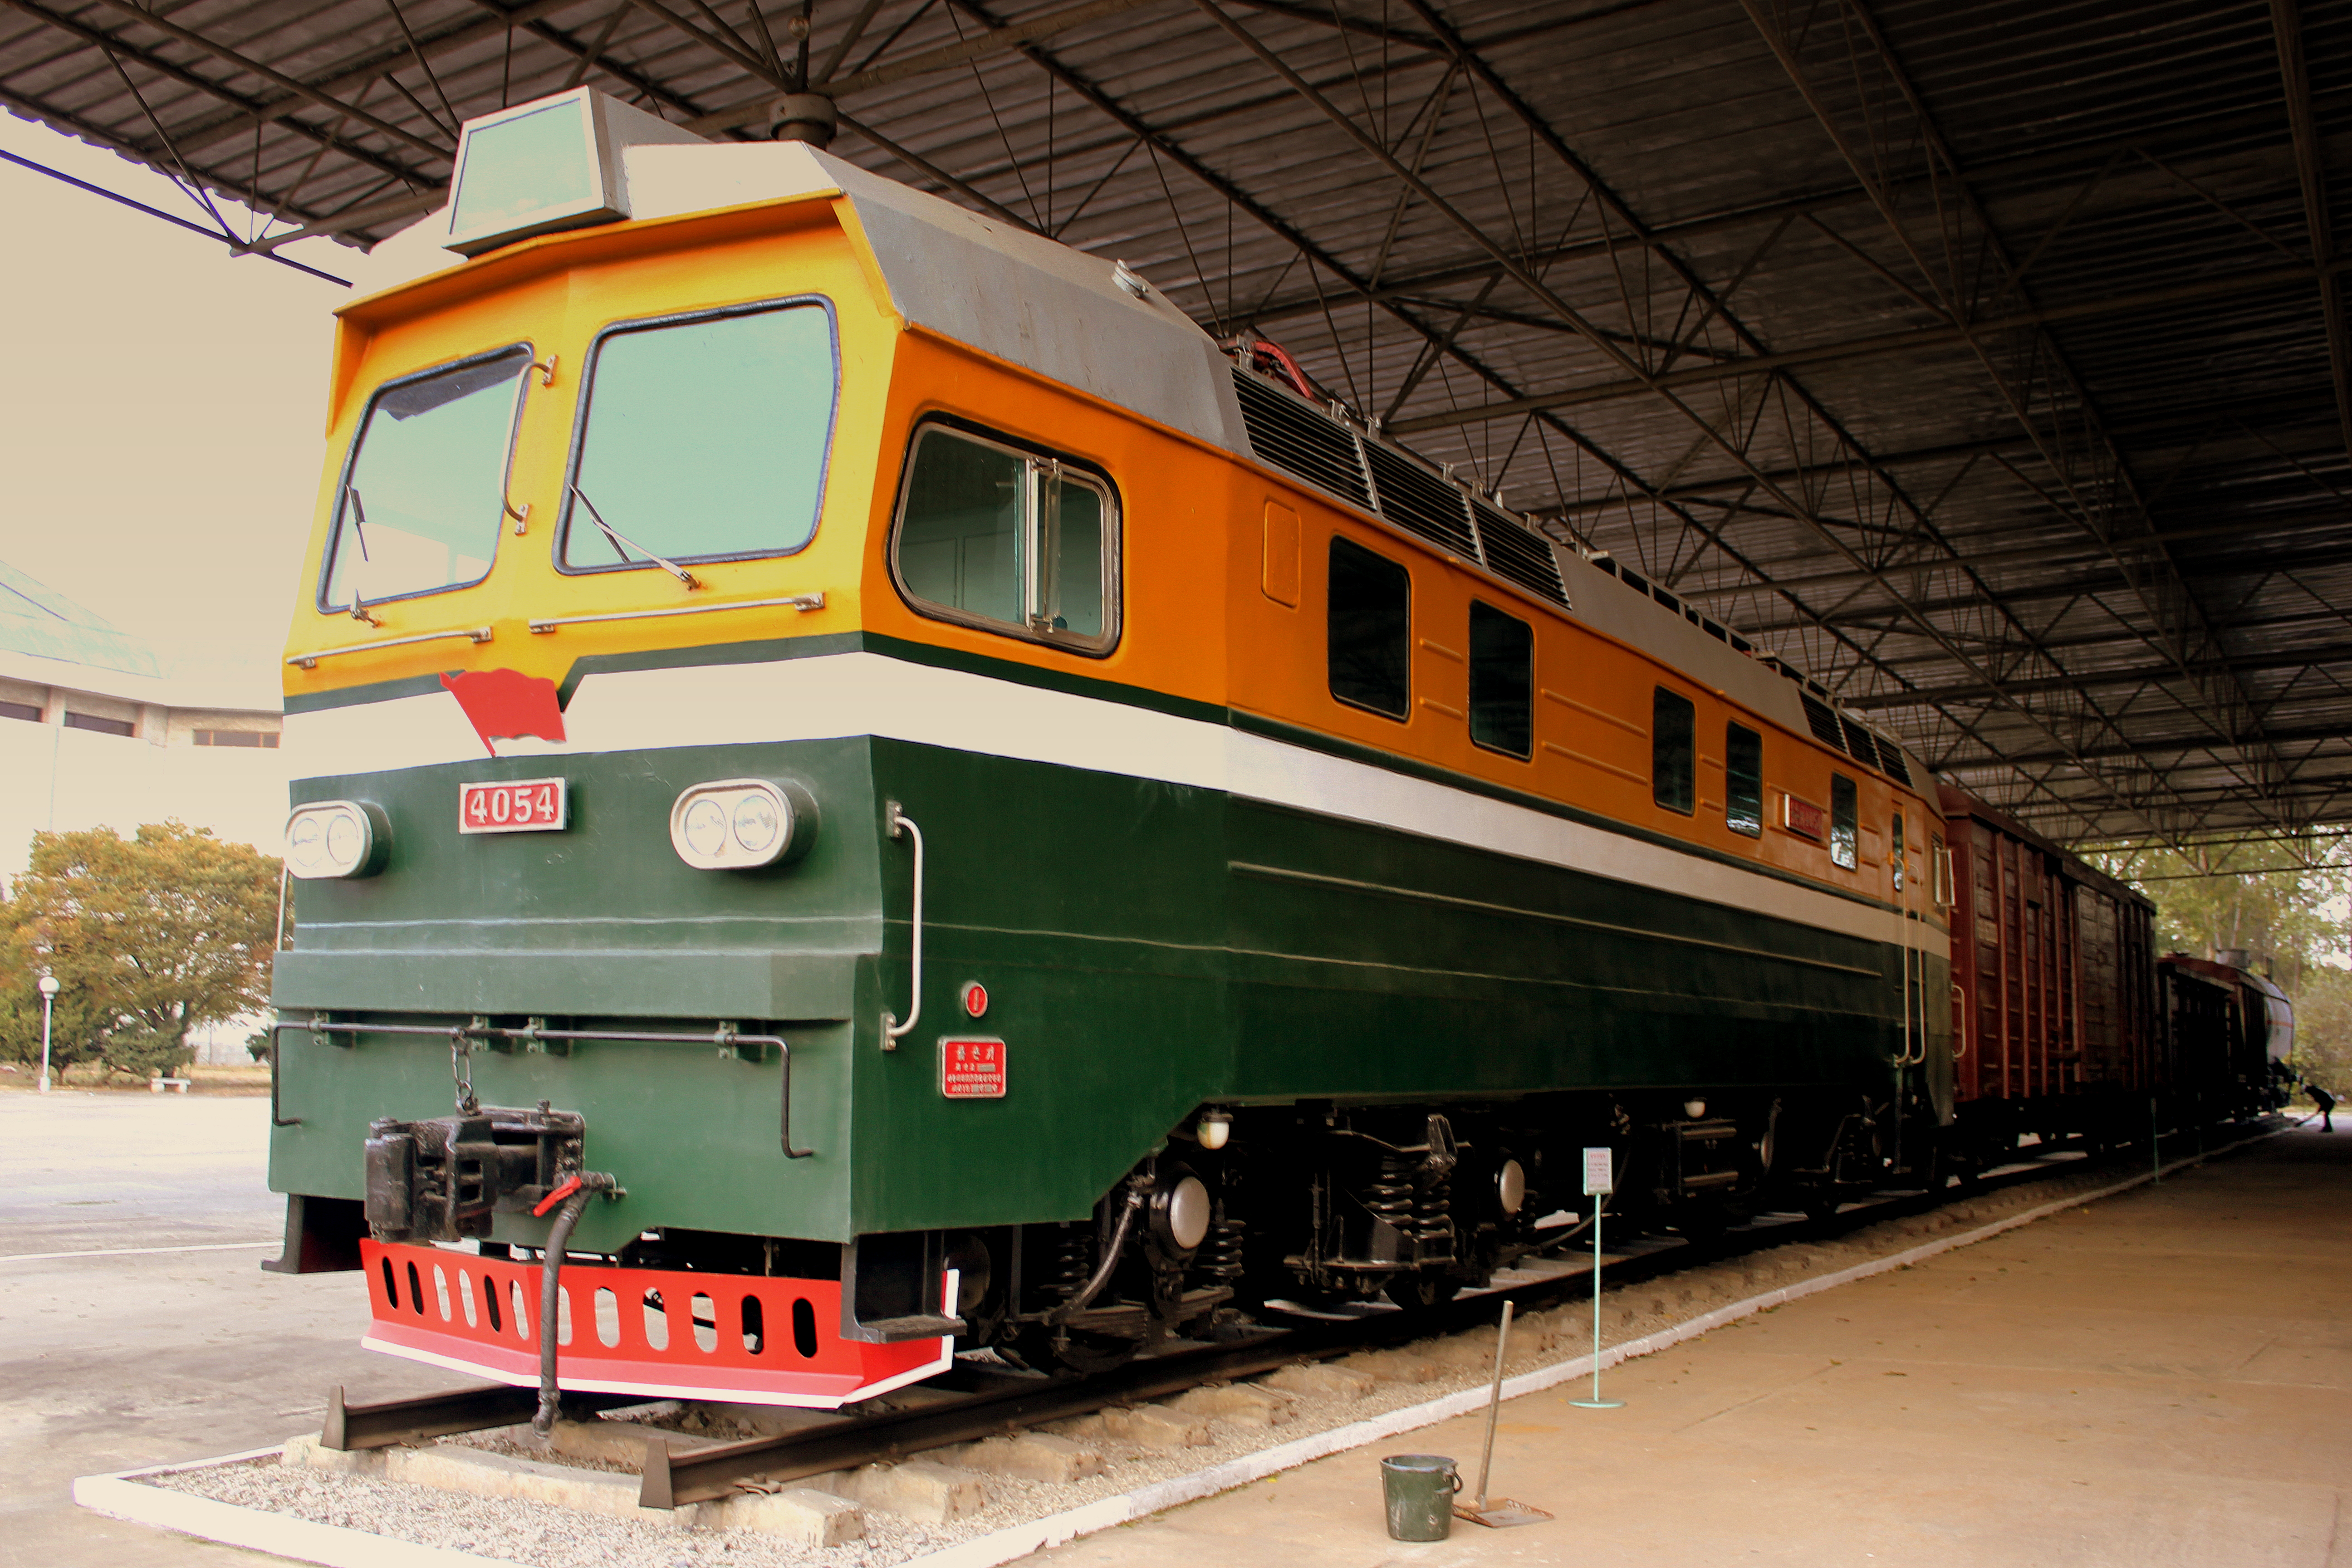 FUNET Railway Photography Archive: North Korea